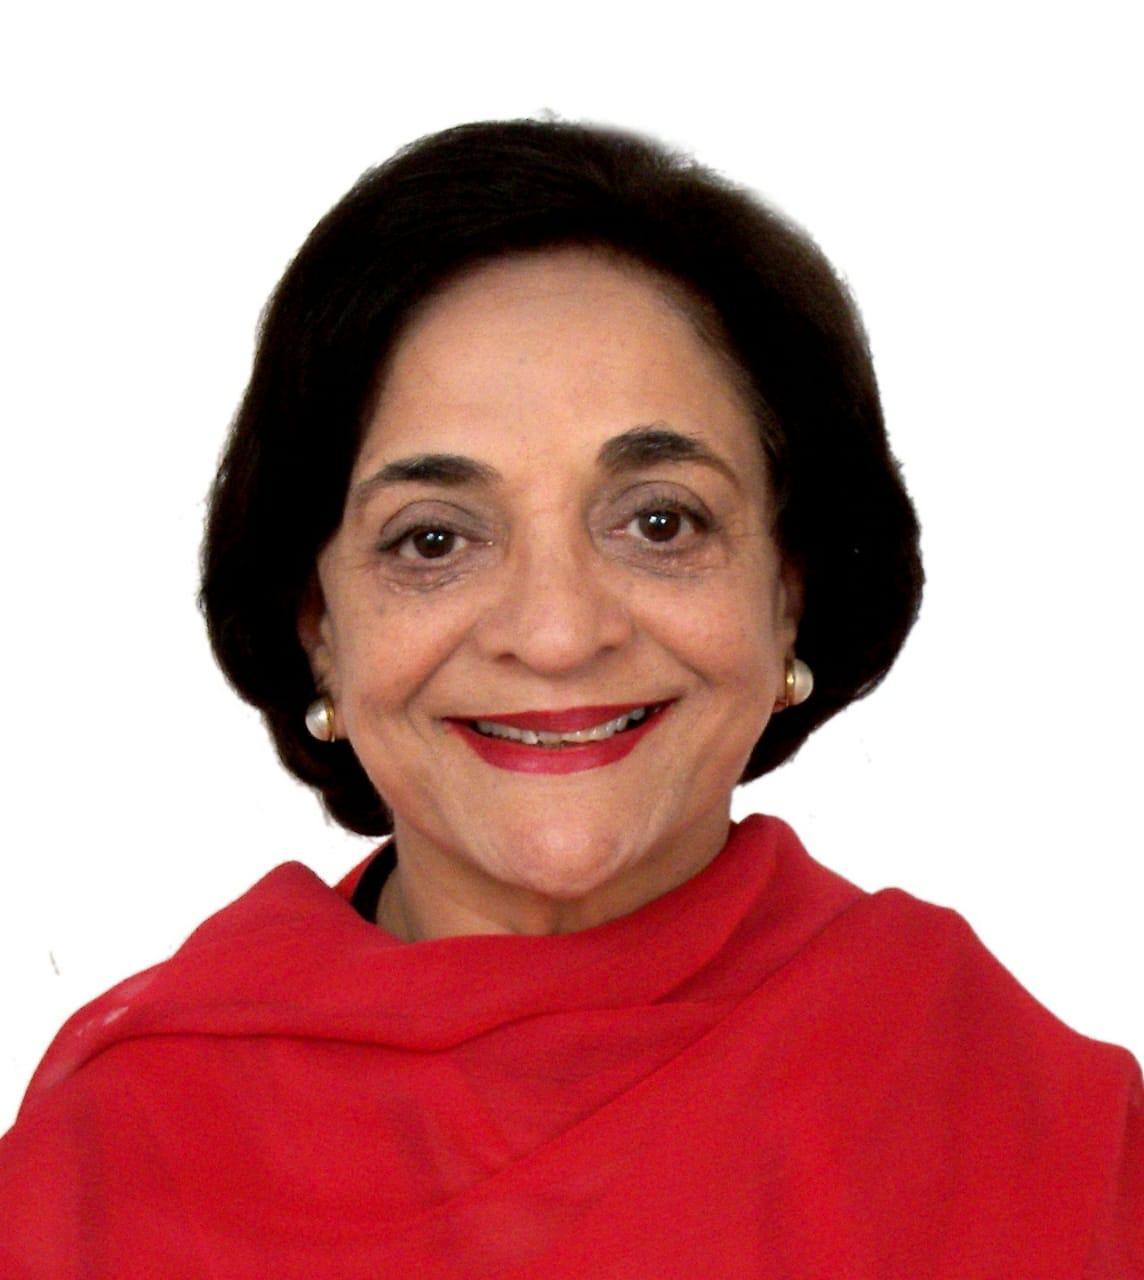 Mrs. Hemant Singh Pasrich